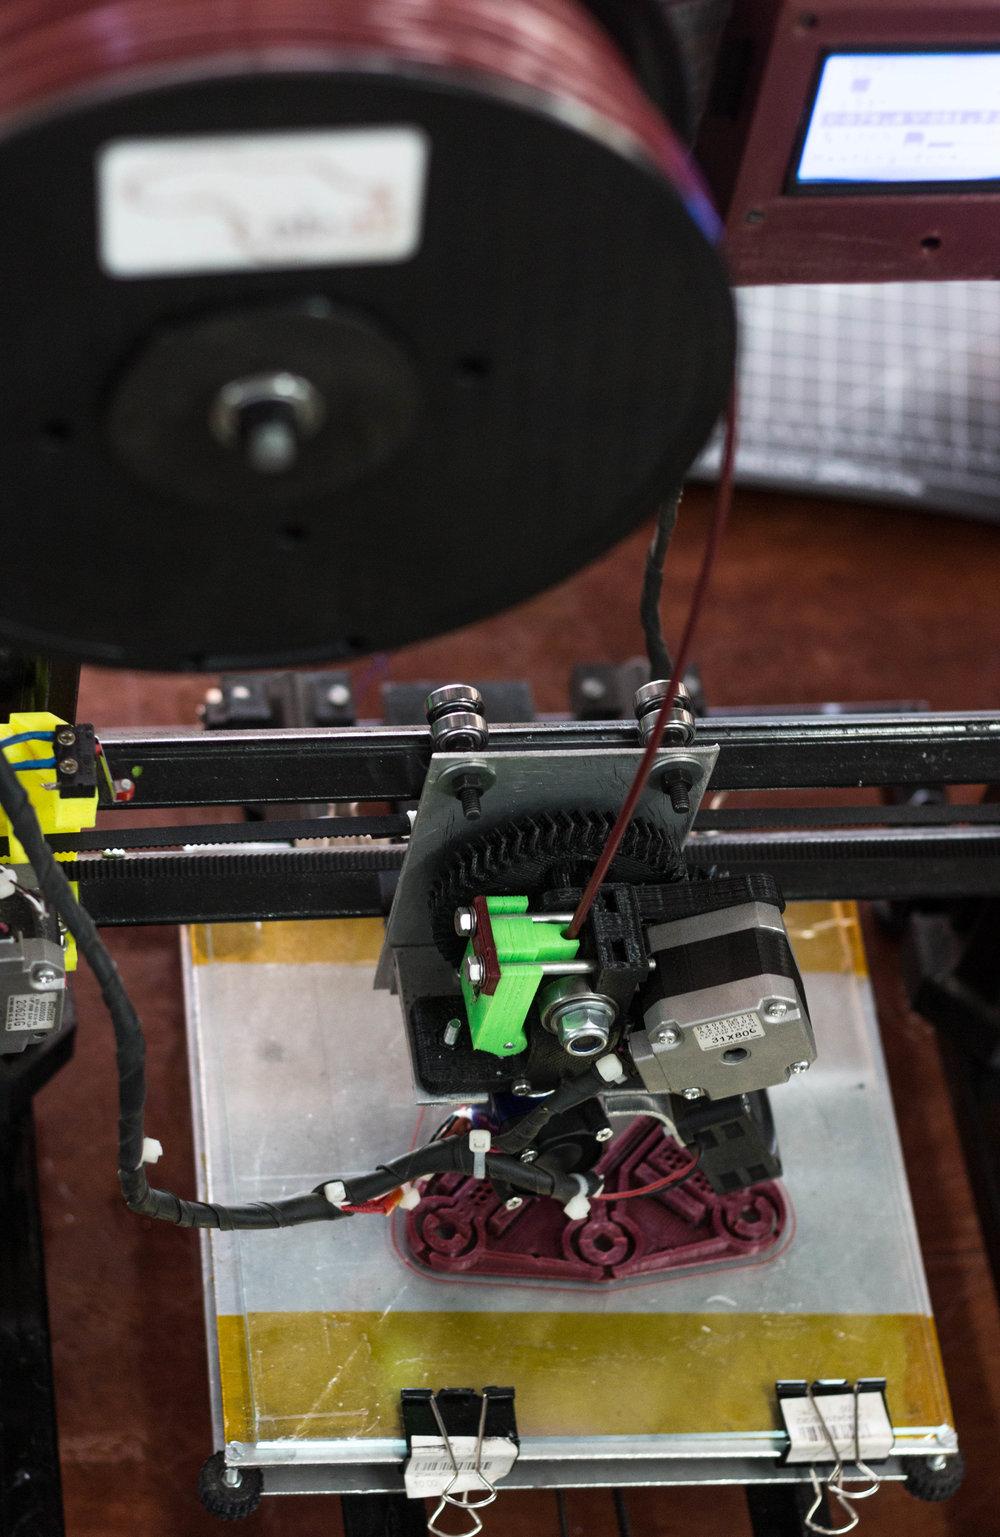 Karl's 3D printer printing the Juakaliscope